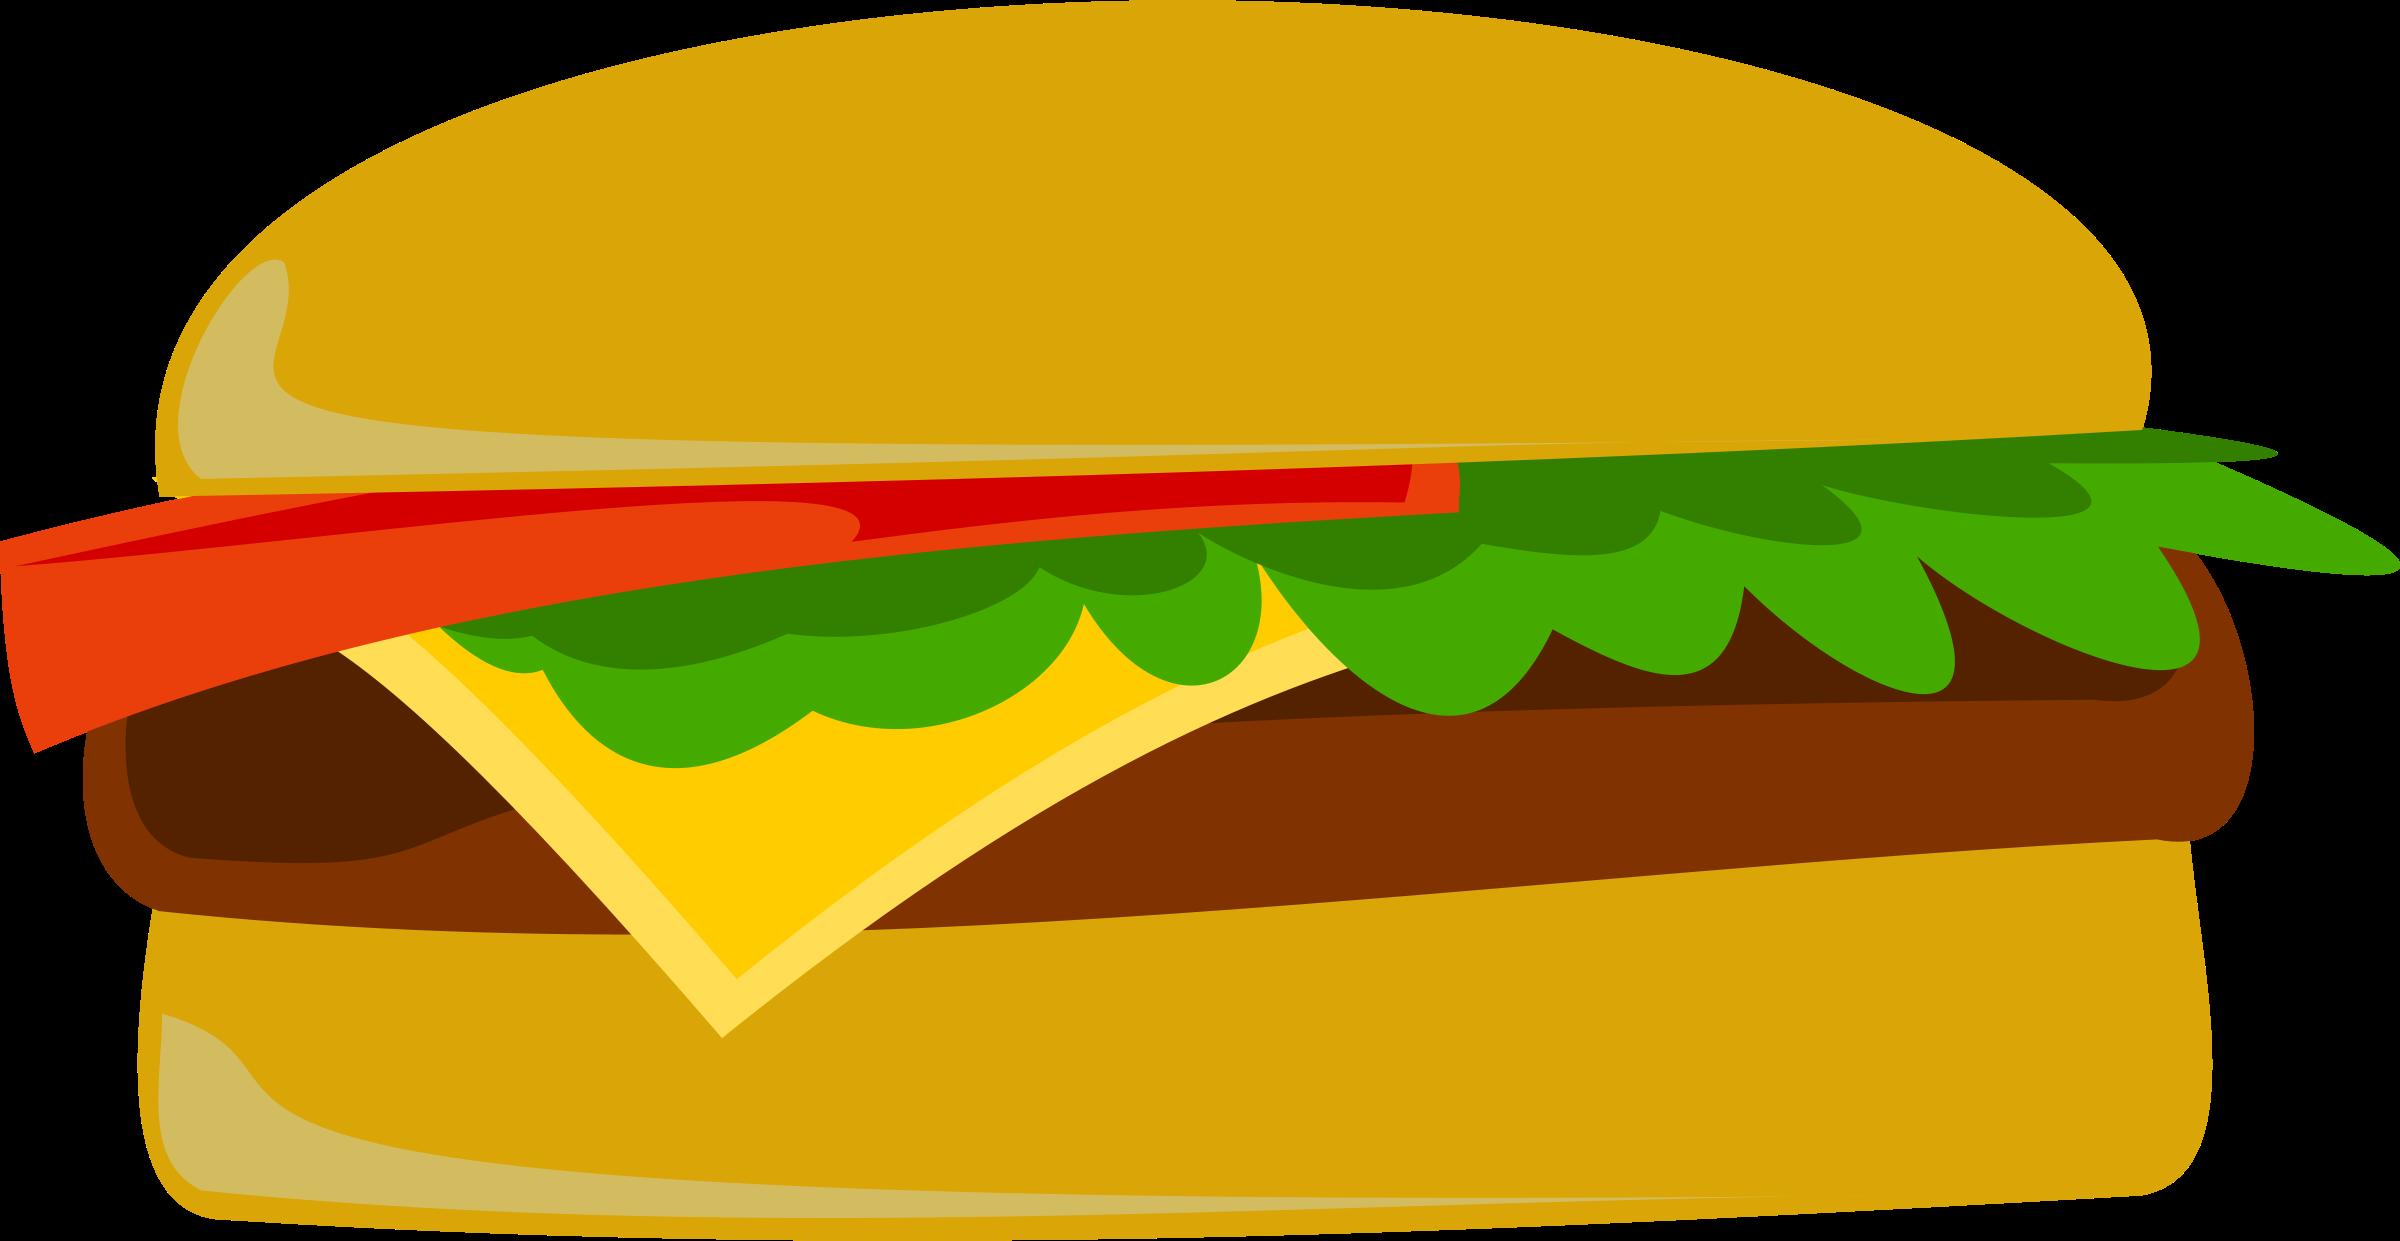 collection of hamburger. Land clipart plain landform